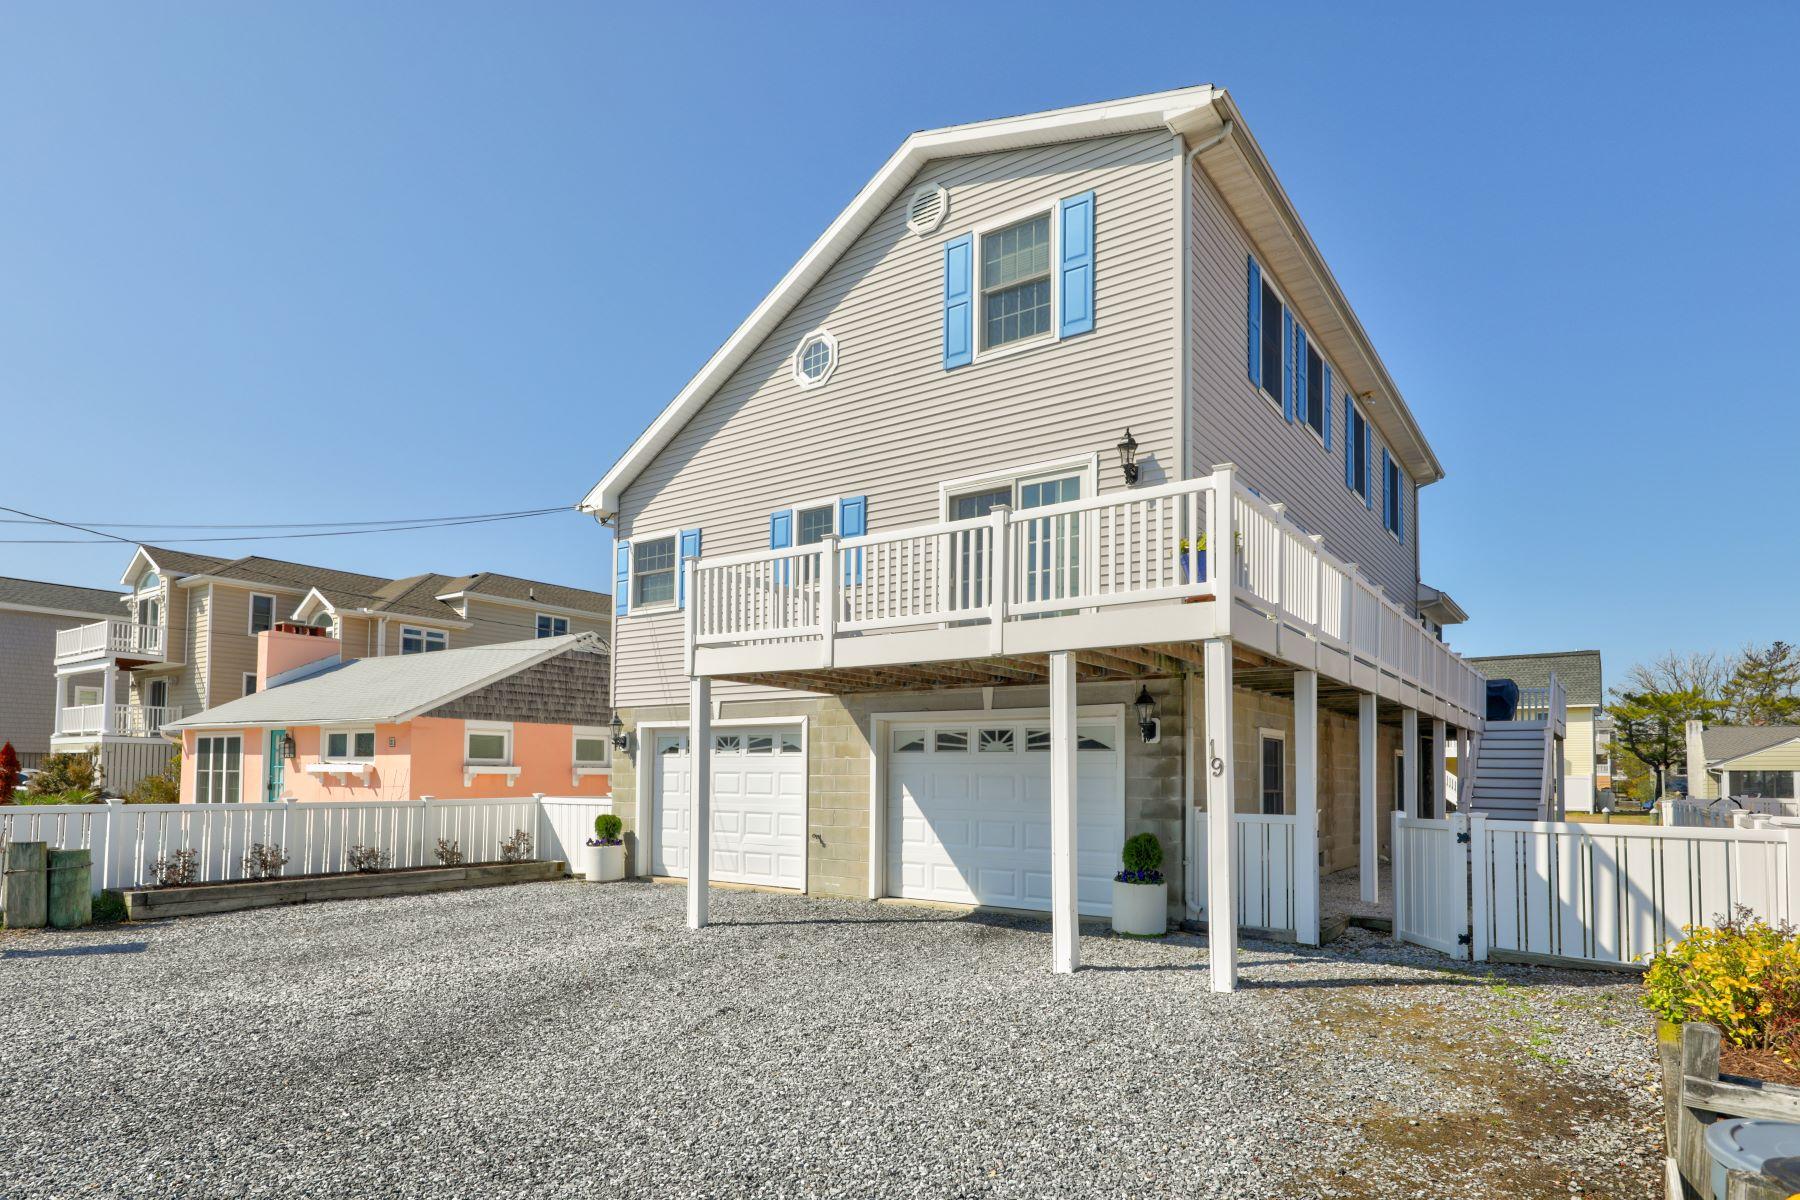 Single Family Homes for Sale at 19 W South Carolina Avenue Fenwick Island, Delaware 19944 United States